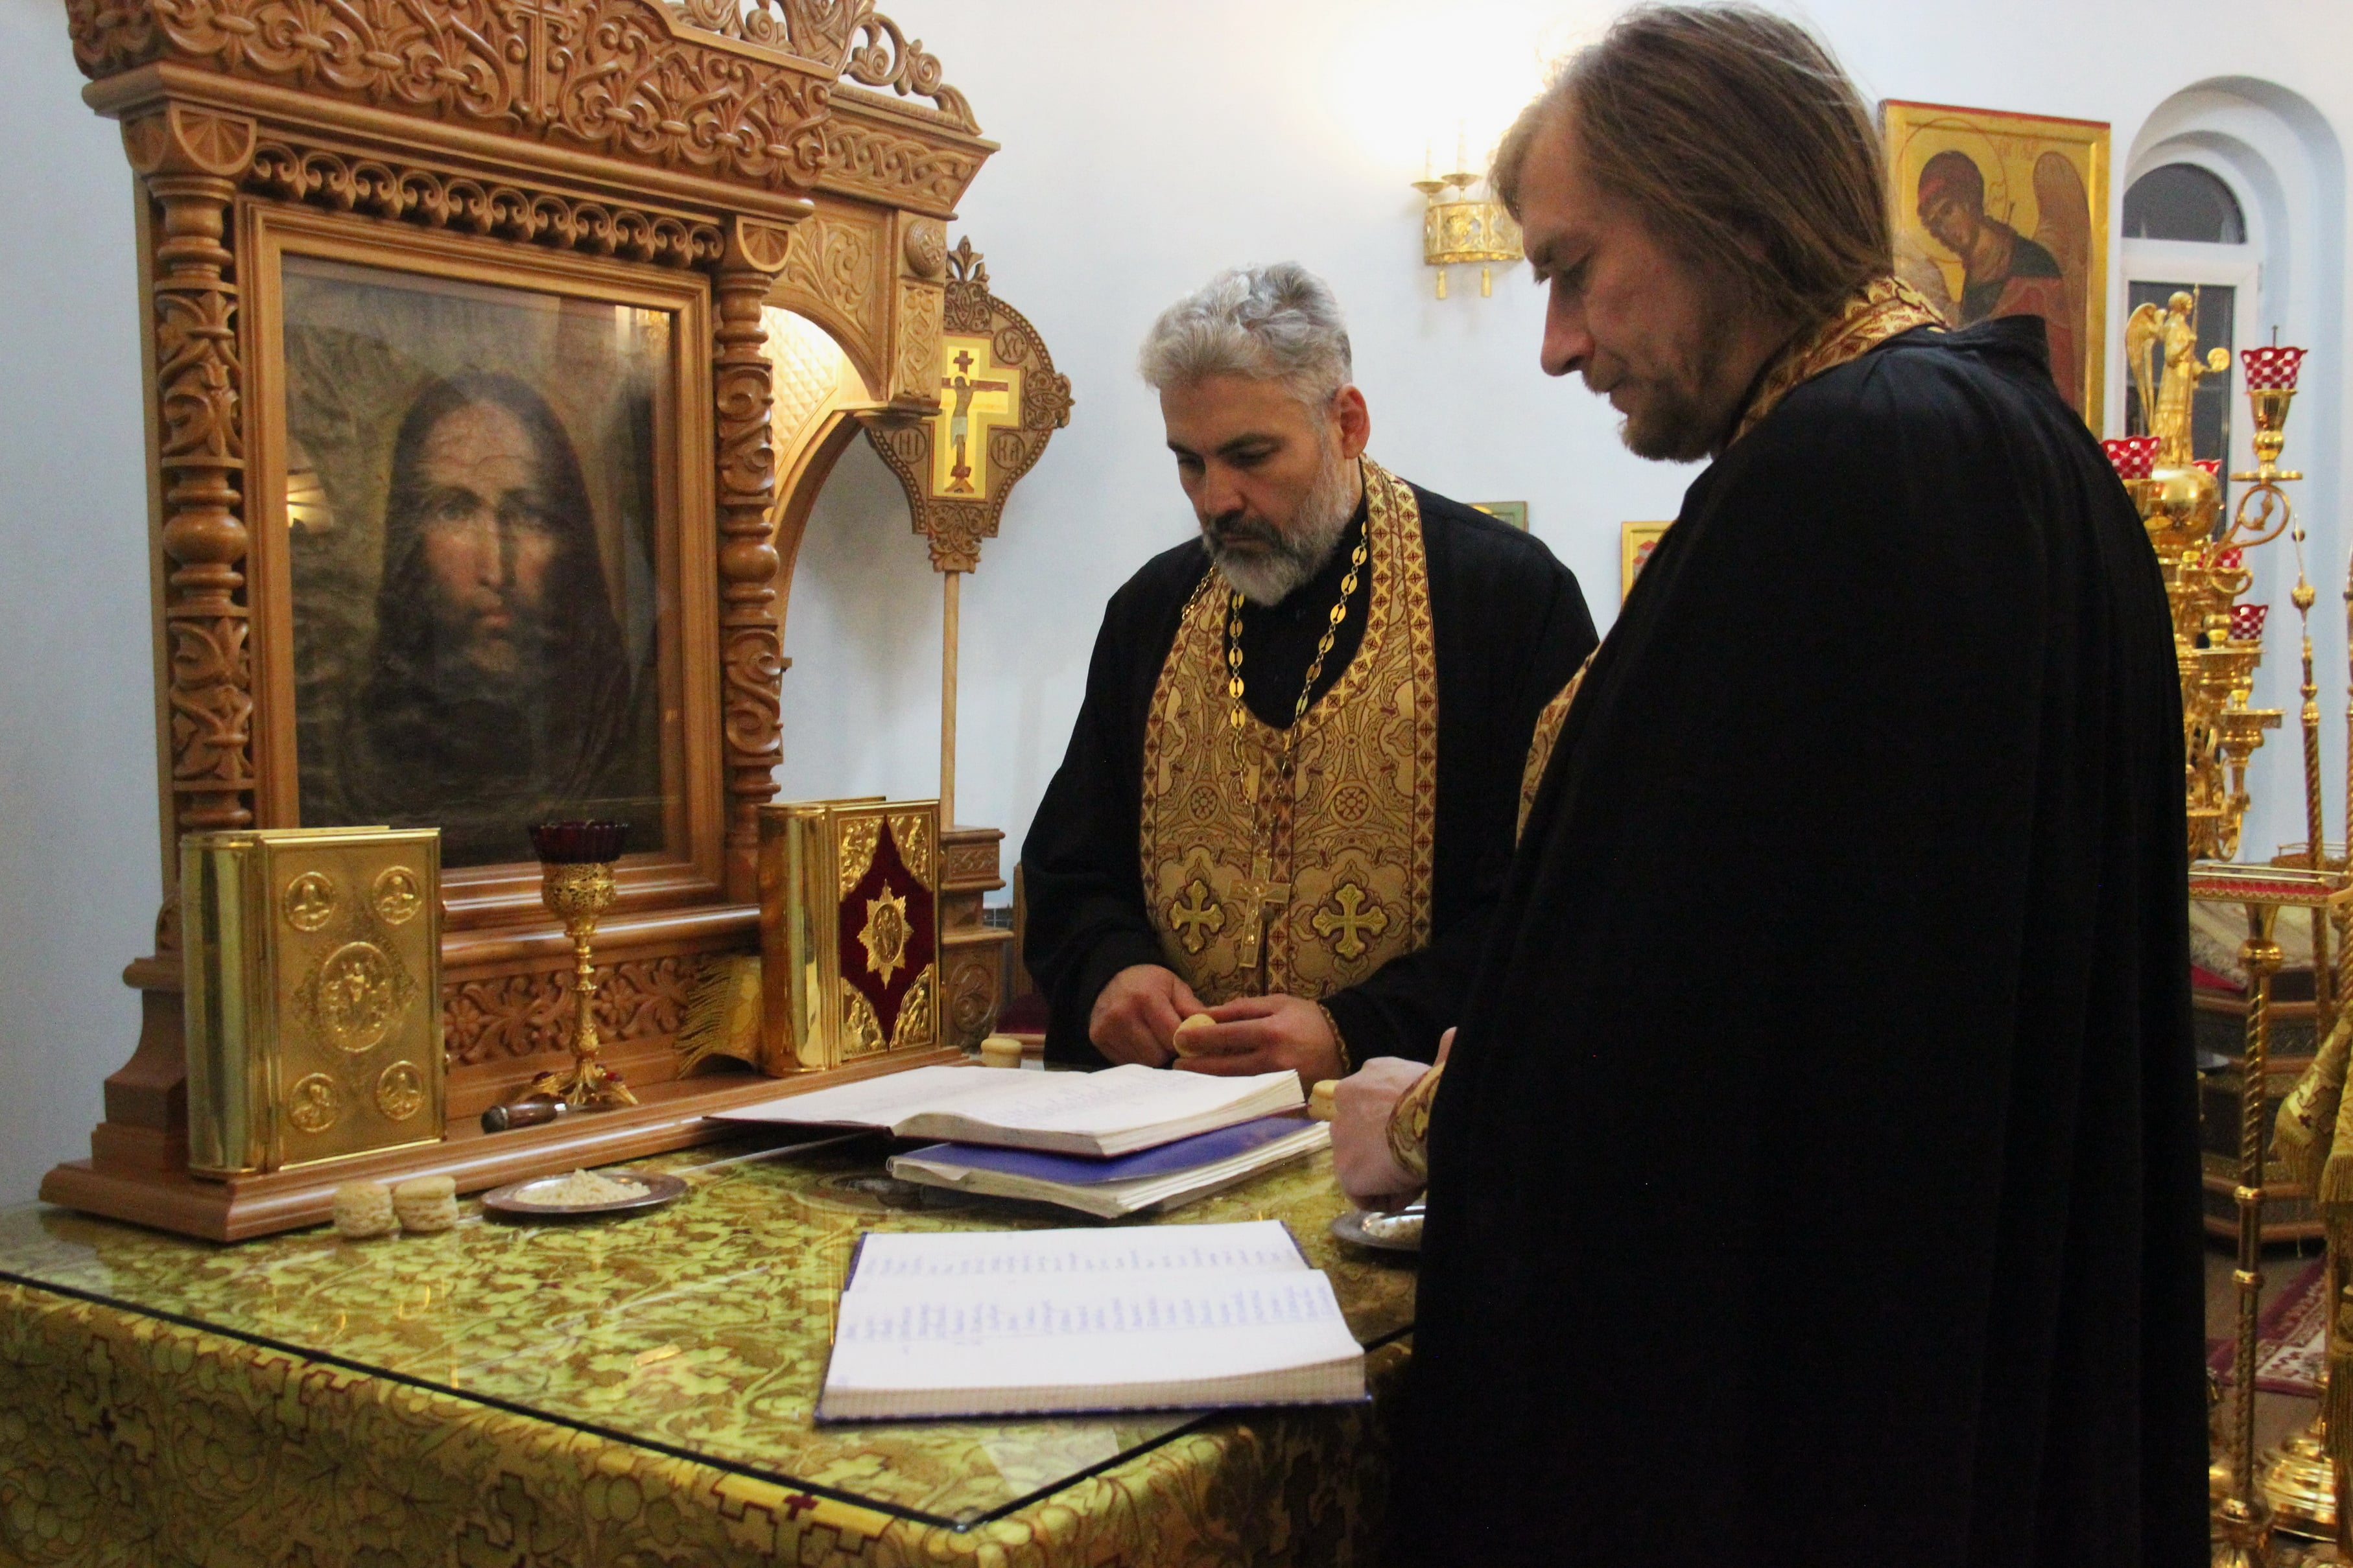 http://monuspen.ru/photoreports/669a621bf7386230cb5ad9071314c3ac.JPG